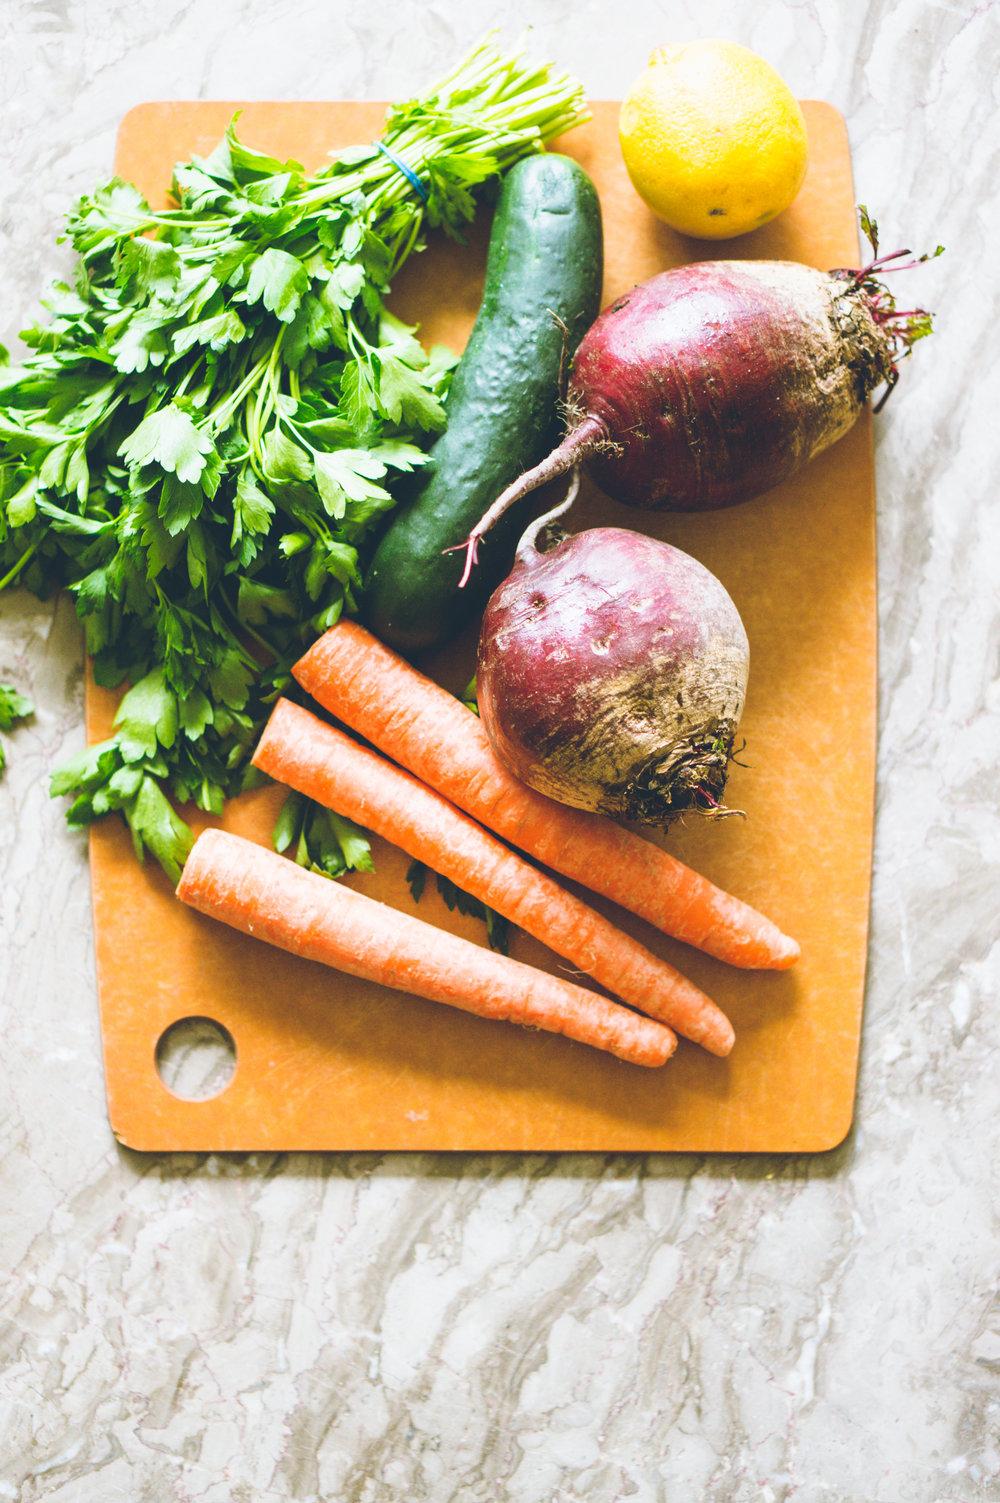 veggies for smoothie 2 (1).jpg